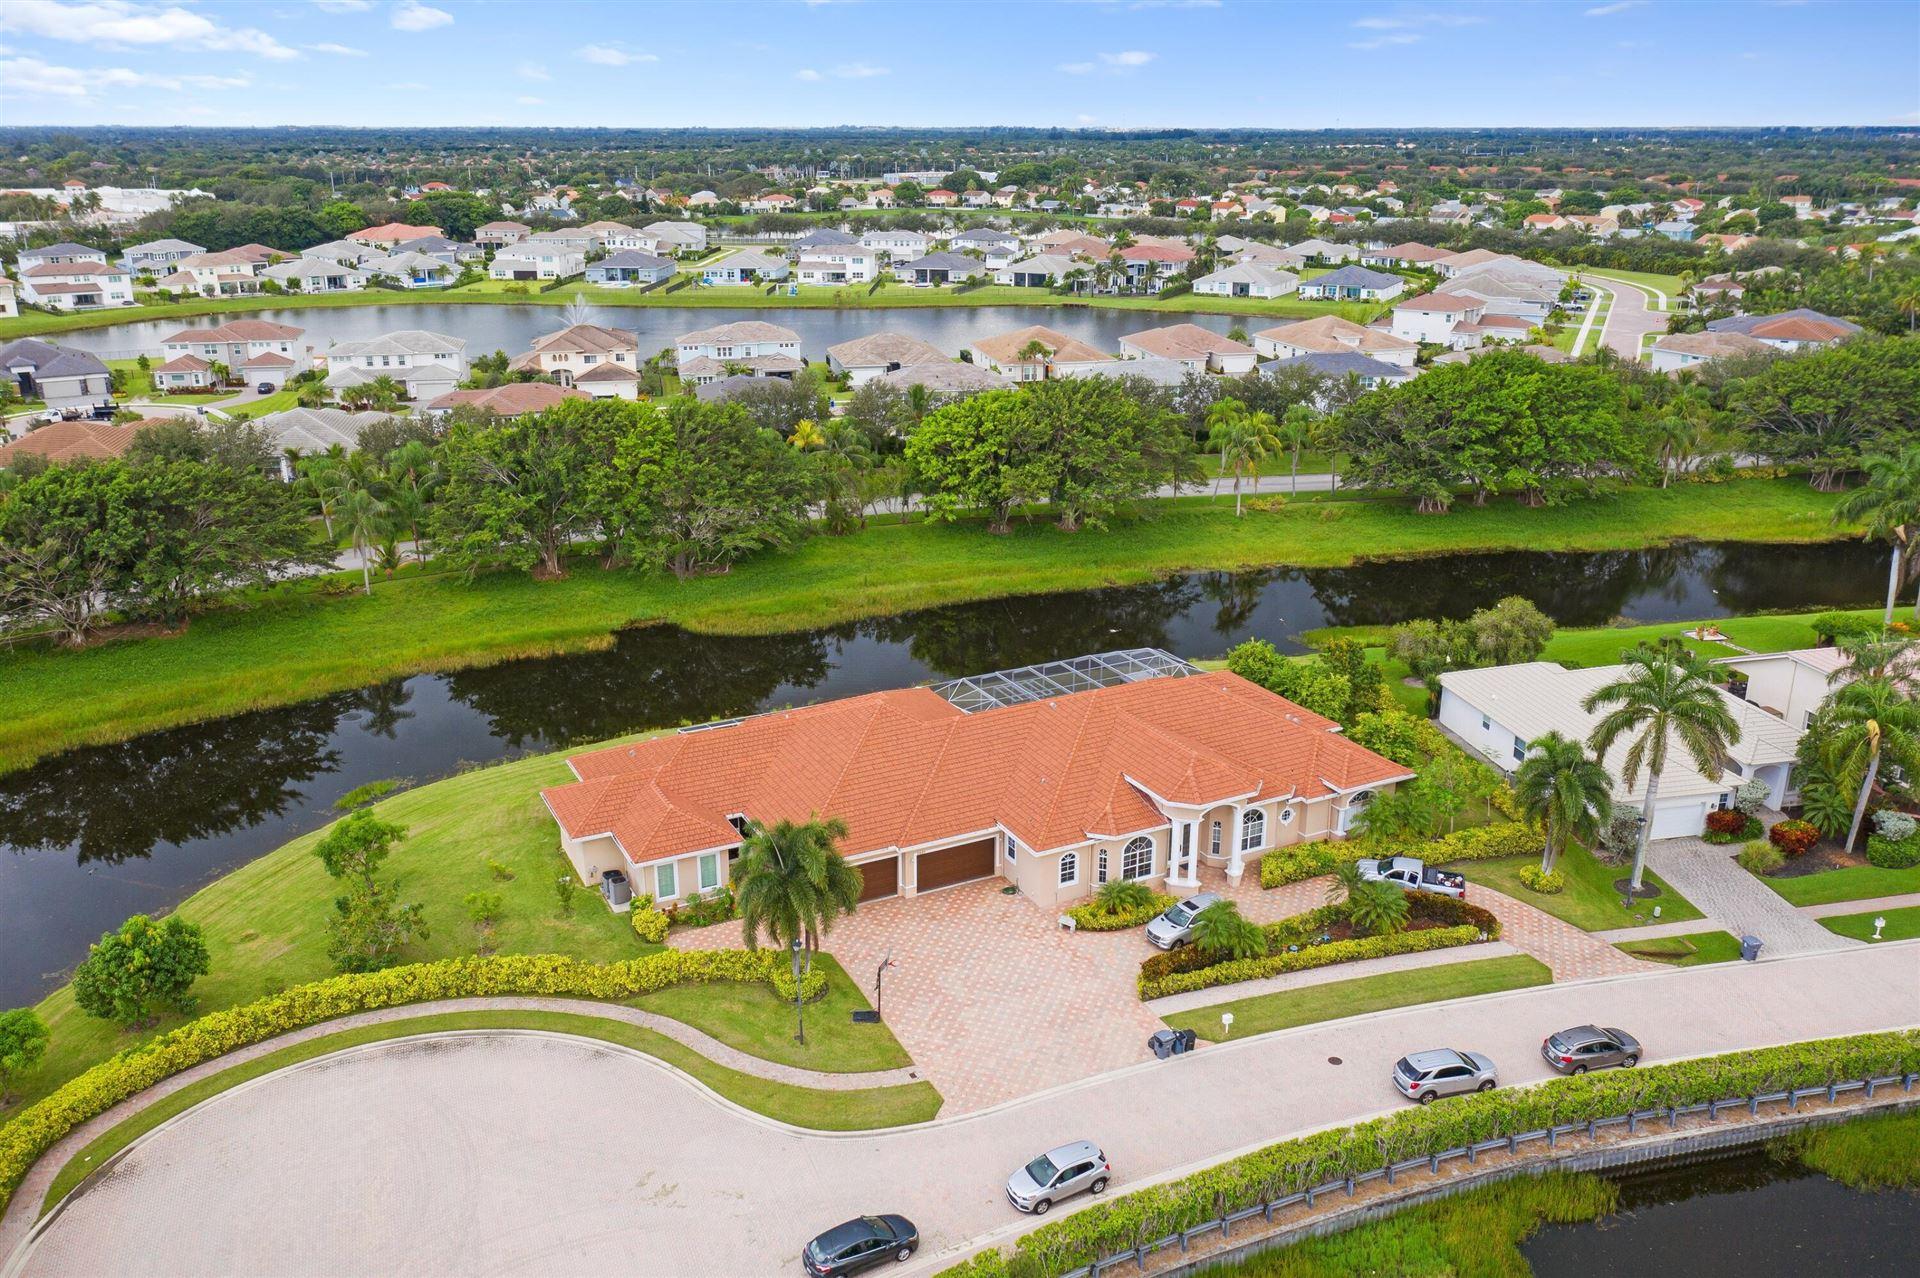 Photo of 6957 Cobia Circle, Boynton Beach, FL 33437 (MLS # RX-10753787)